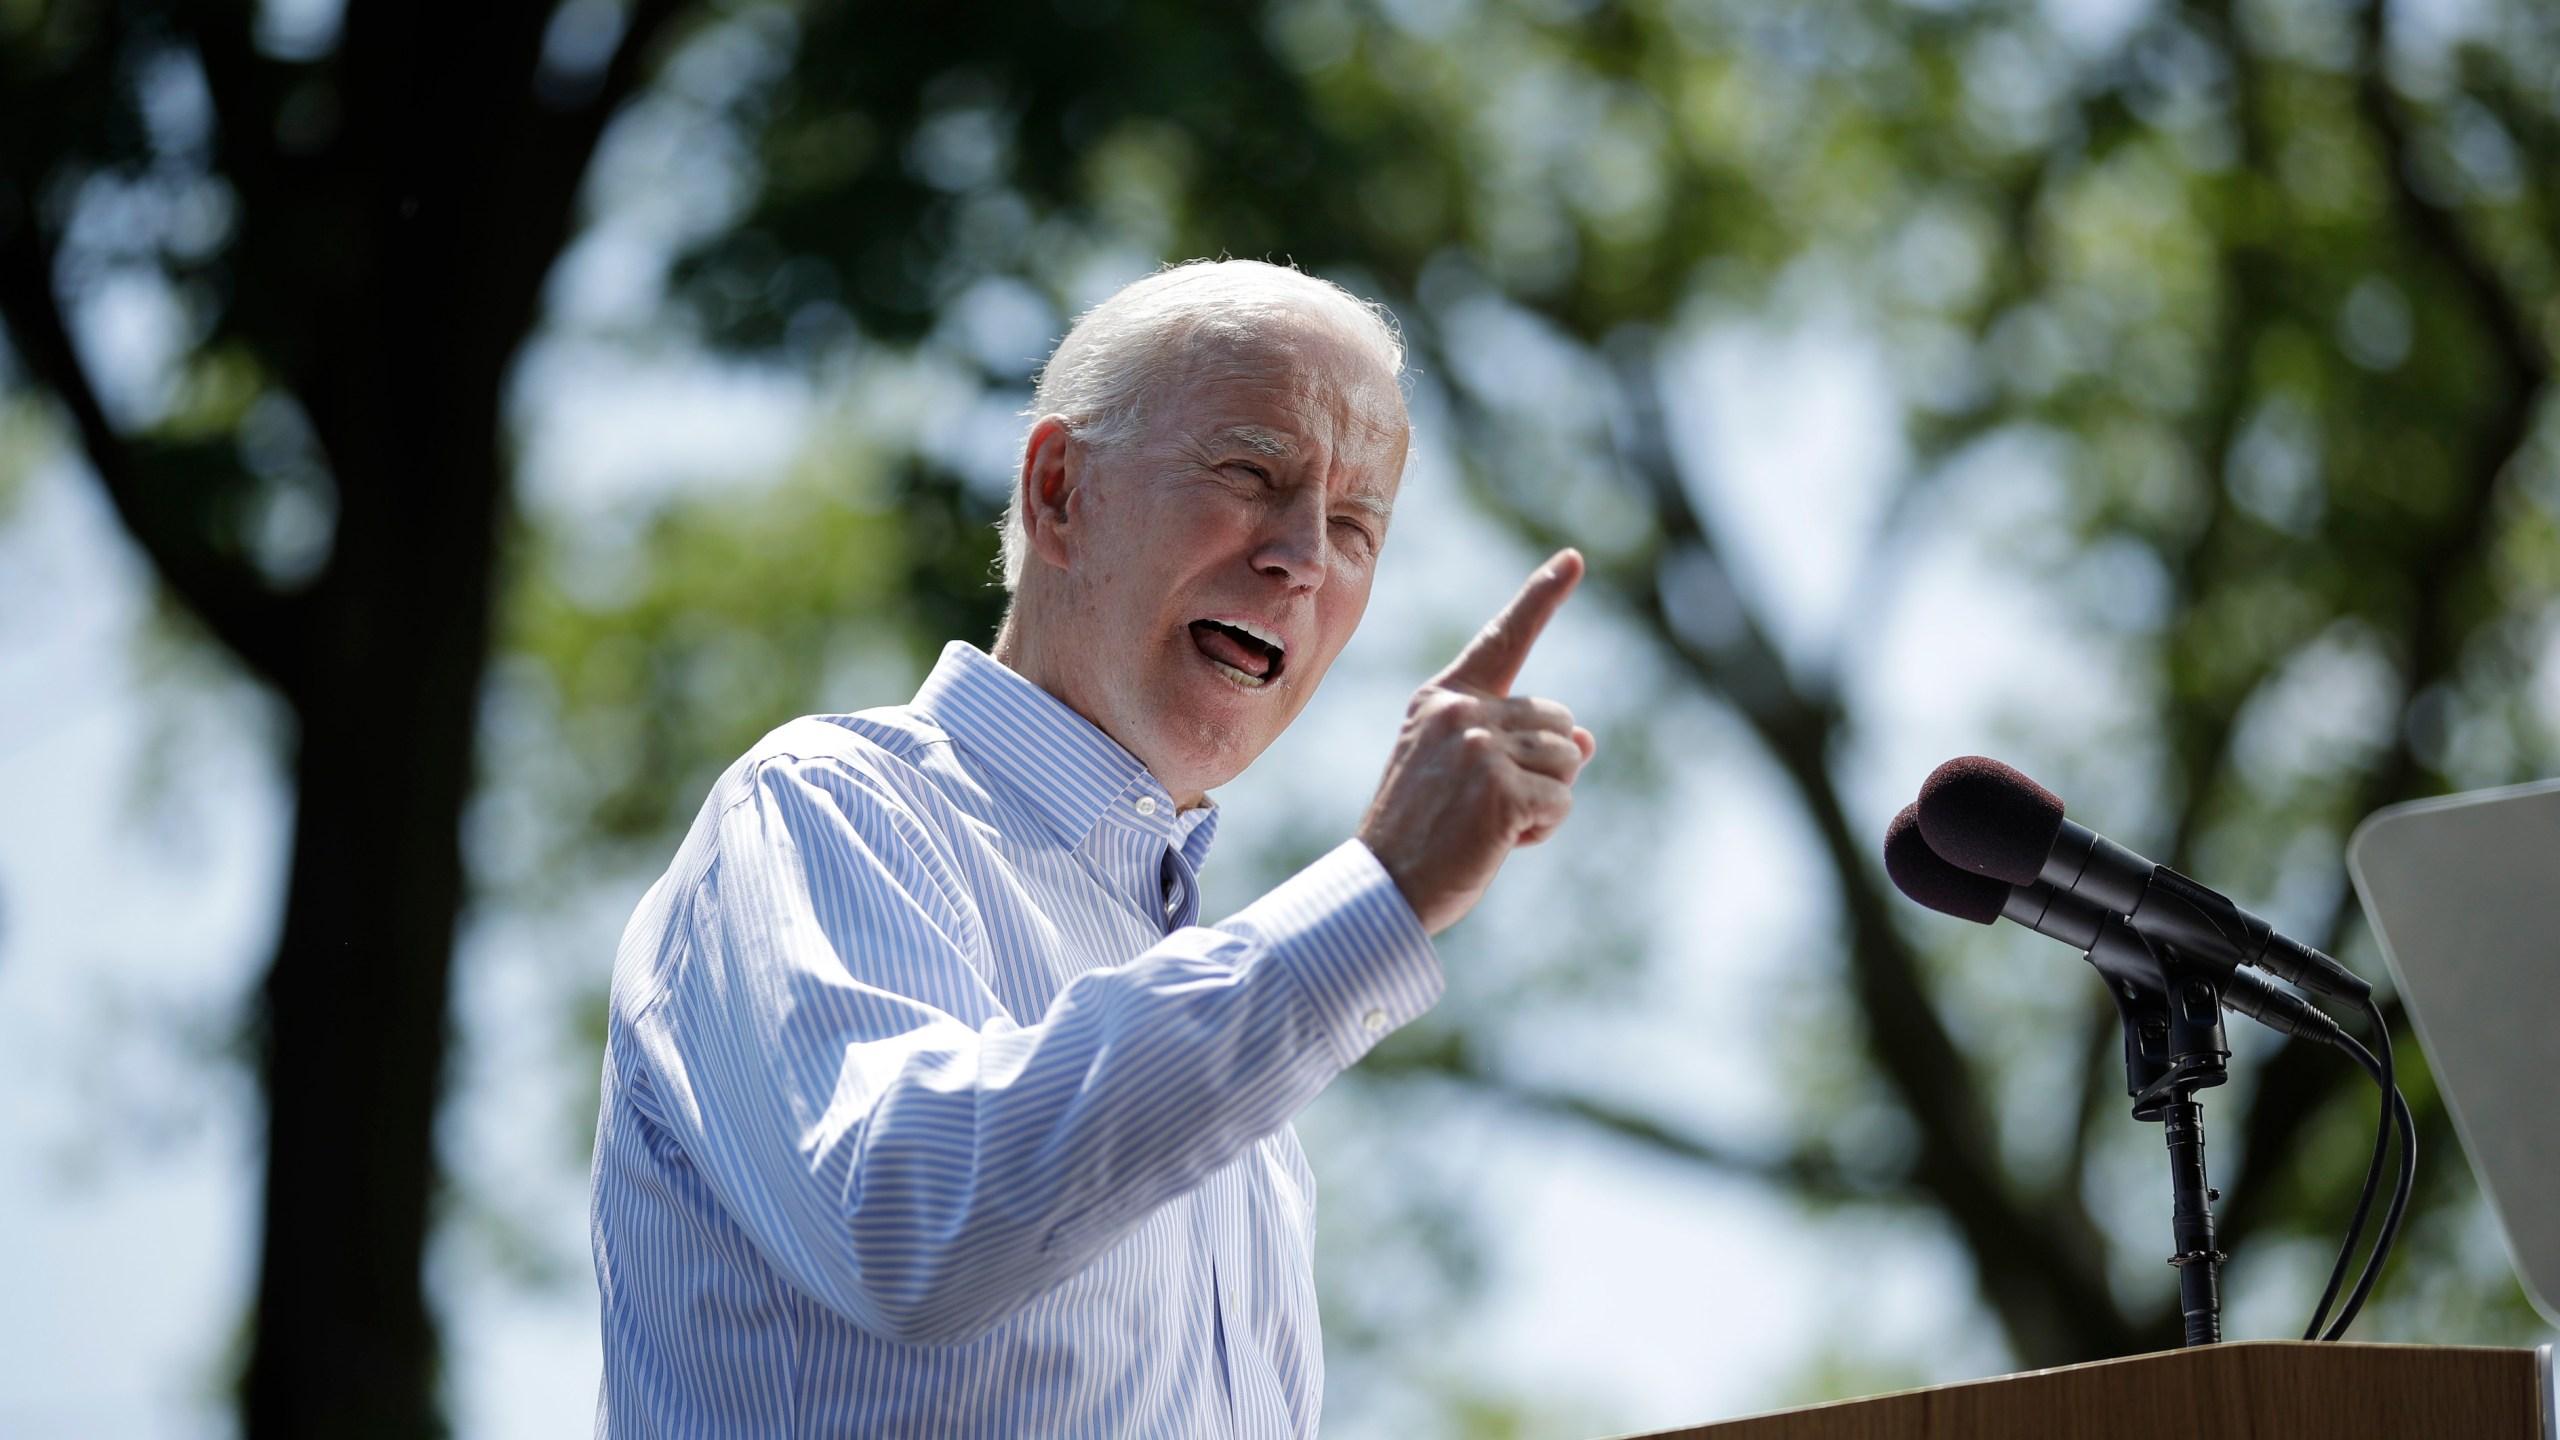 Election_2020_Joe_Biden_31024-159532.jpg26309227